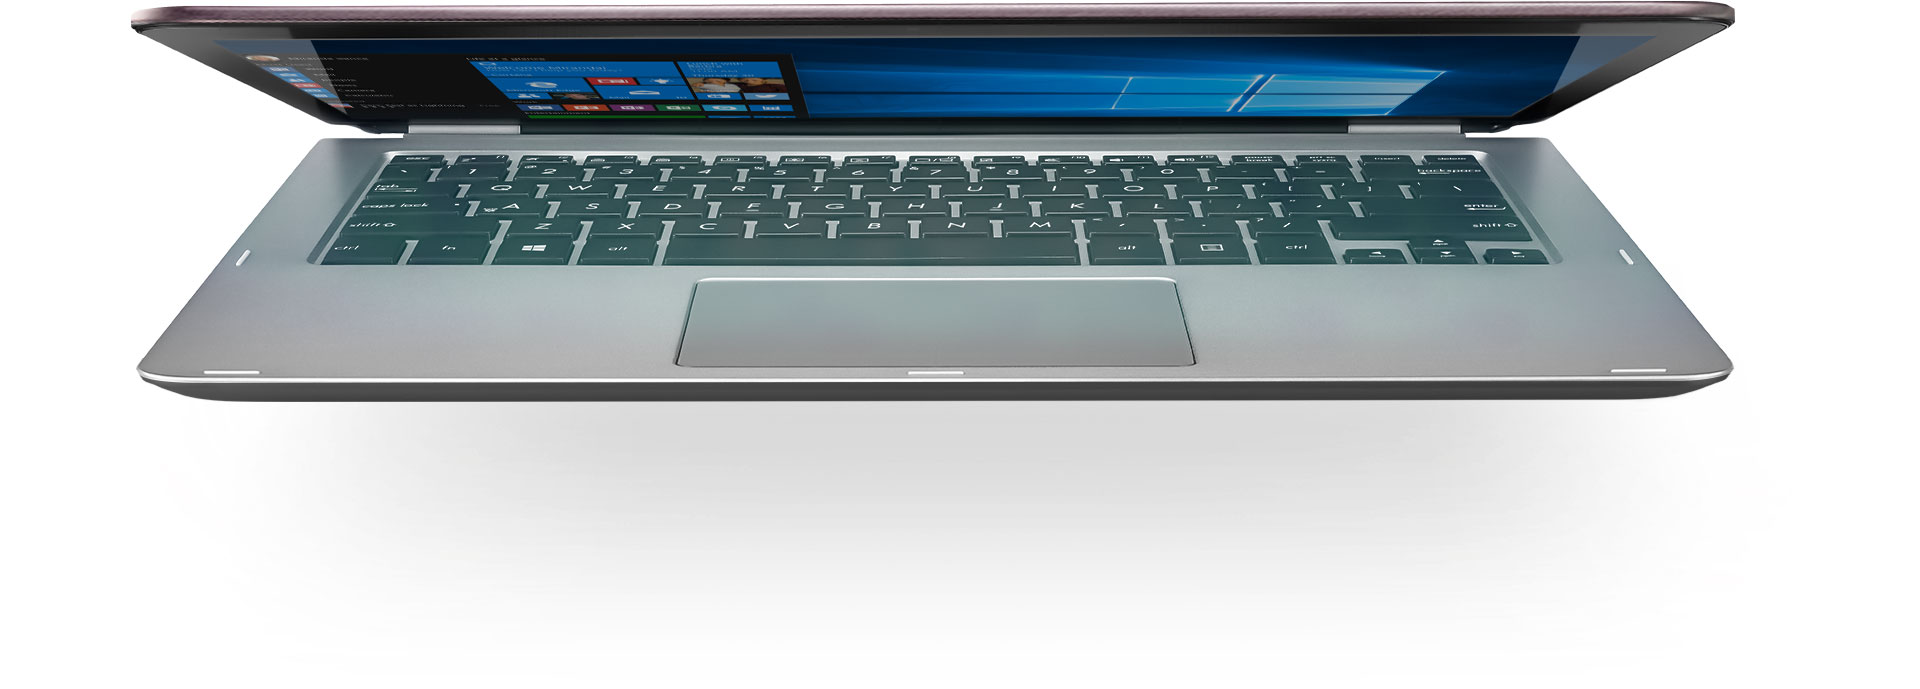 ASUS VivoBook Flip TP501UQ 2 in 1 PCs Global